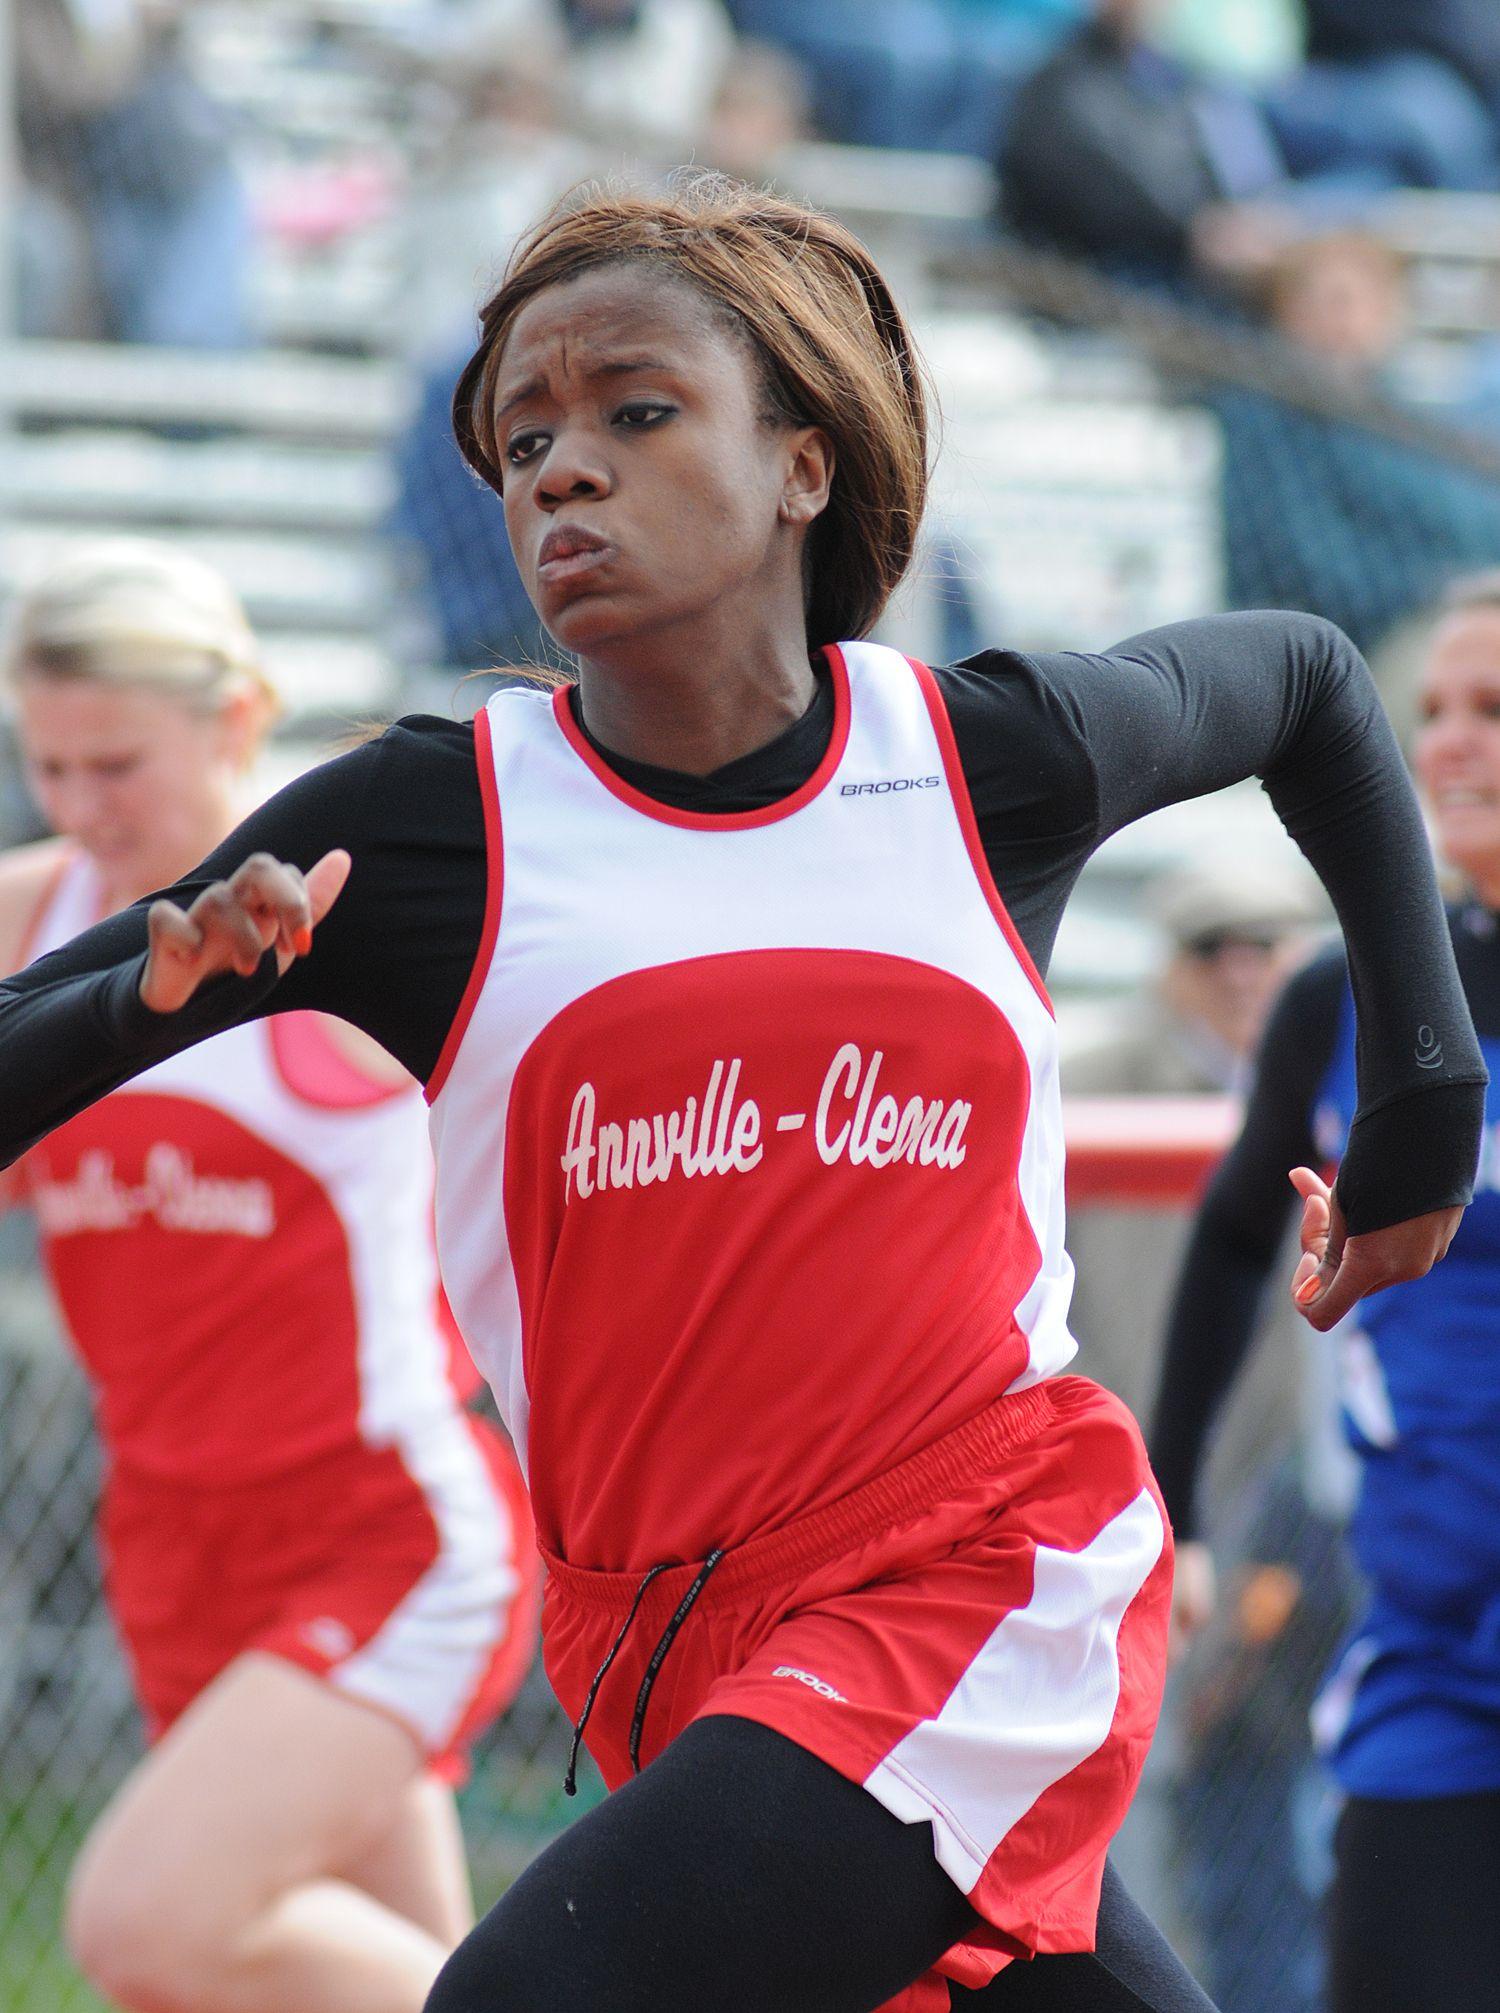 AnnvilleCleona's Angel Jacabella during the 100m dash